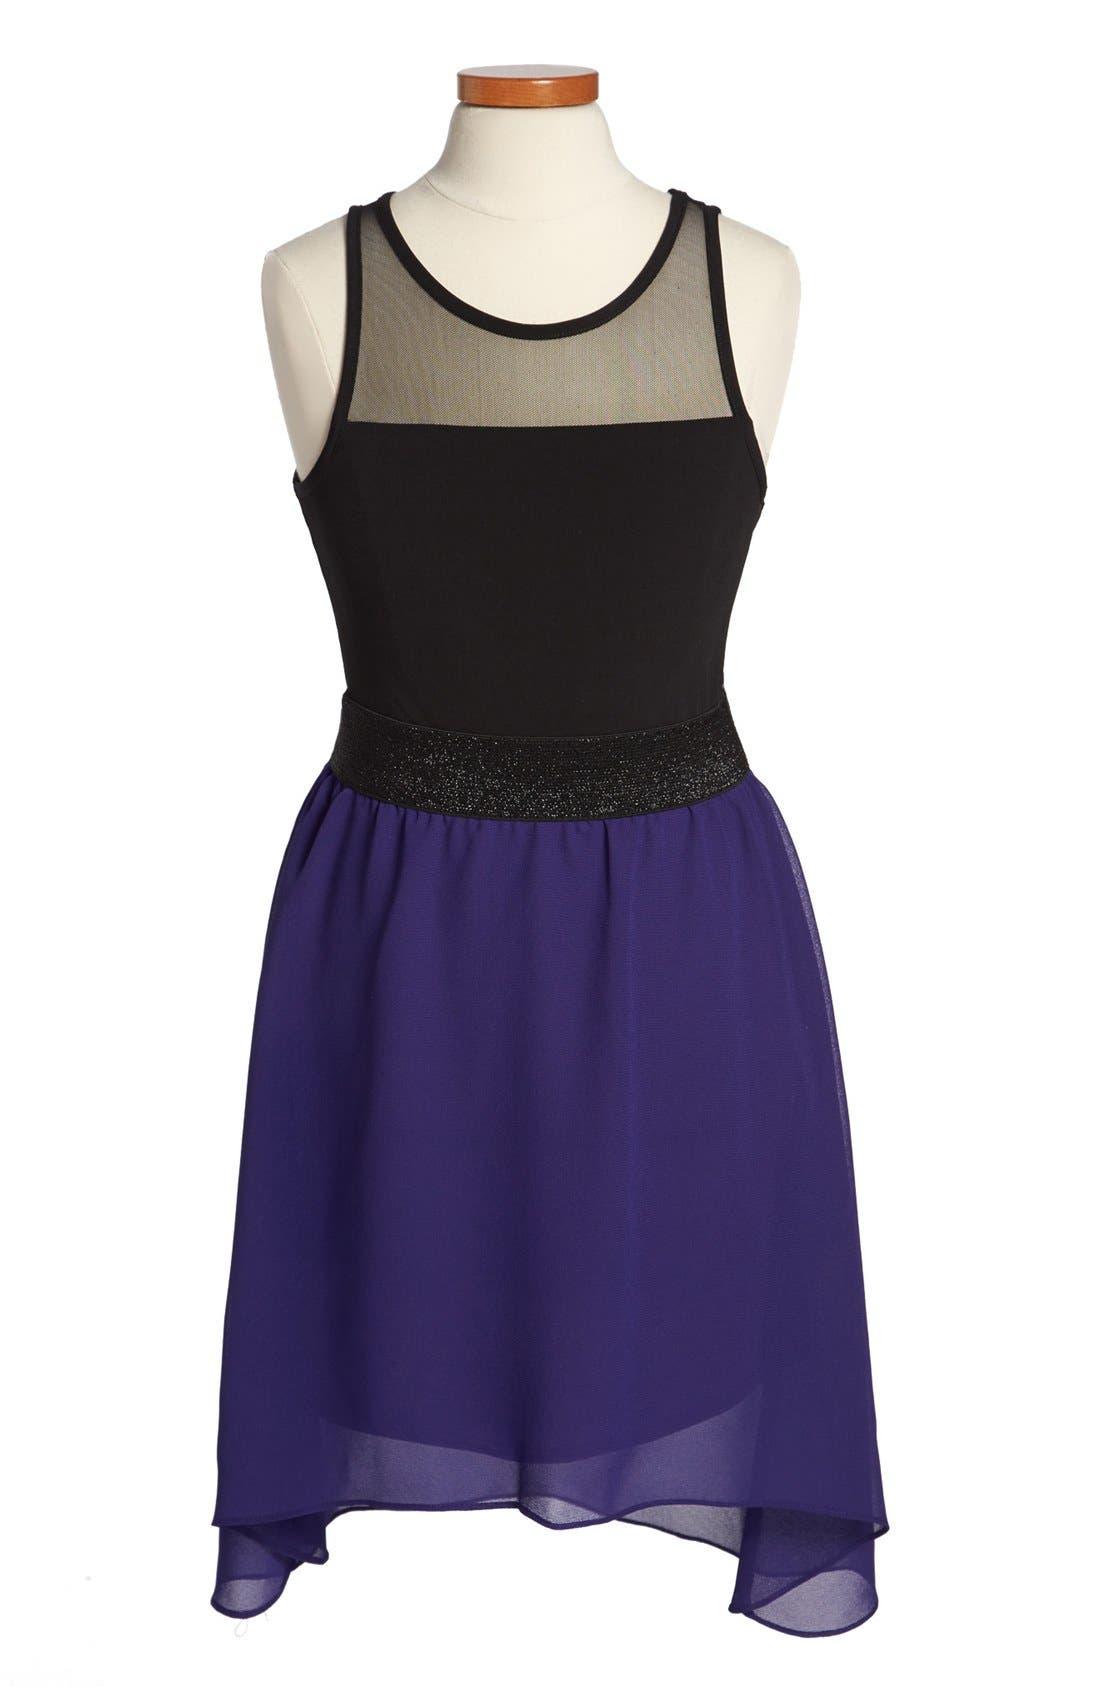 Alternate Image 1 Selected - Sally Miller 'Carly' Dress (Big Girls)